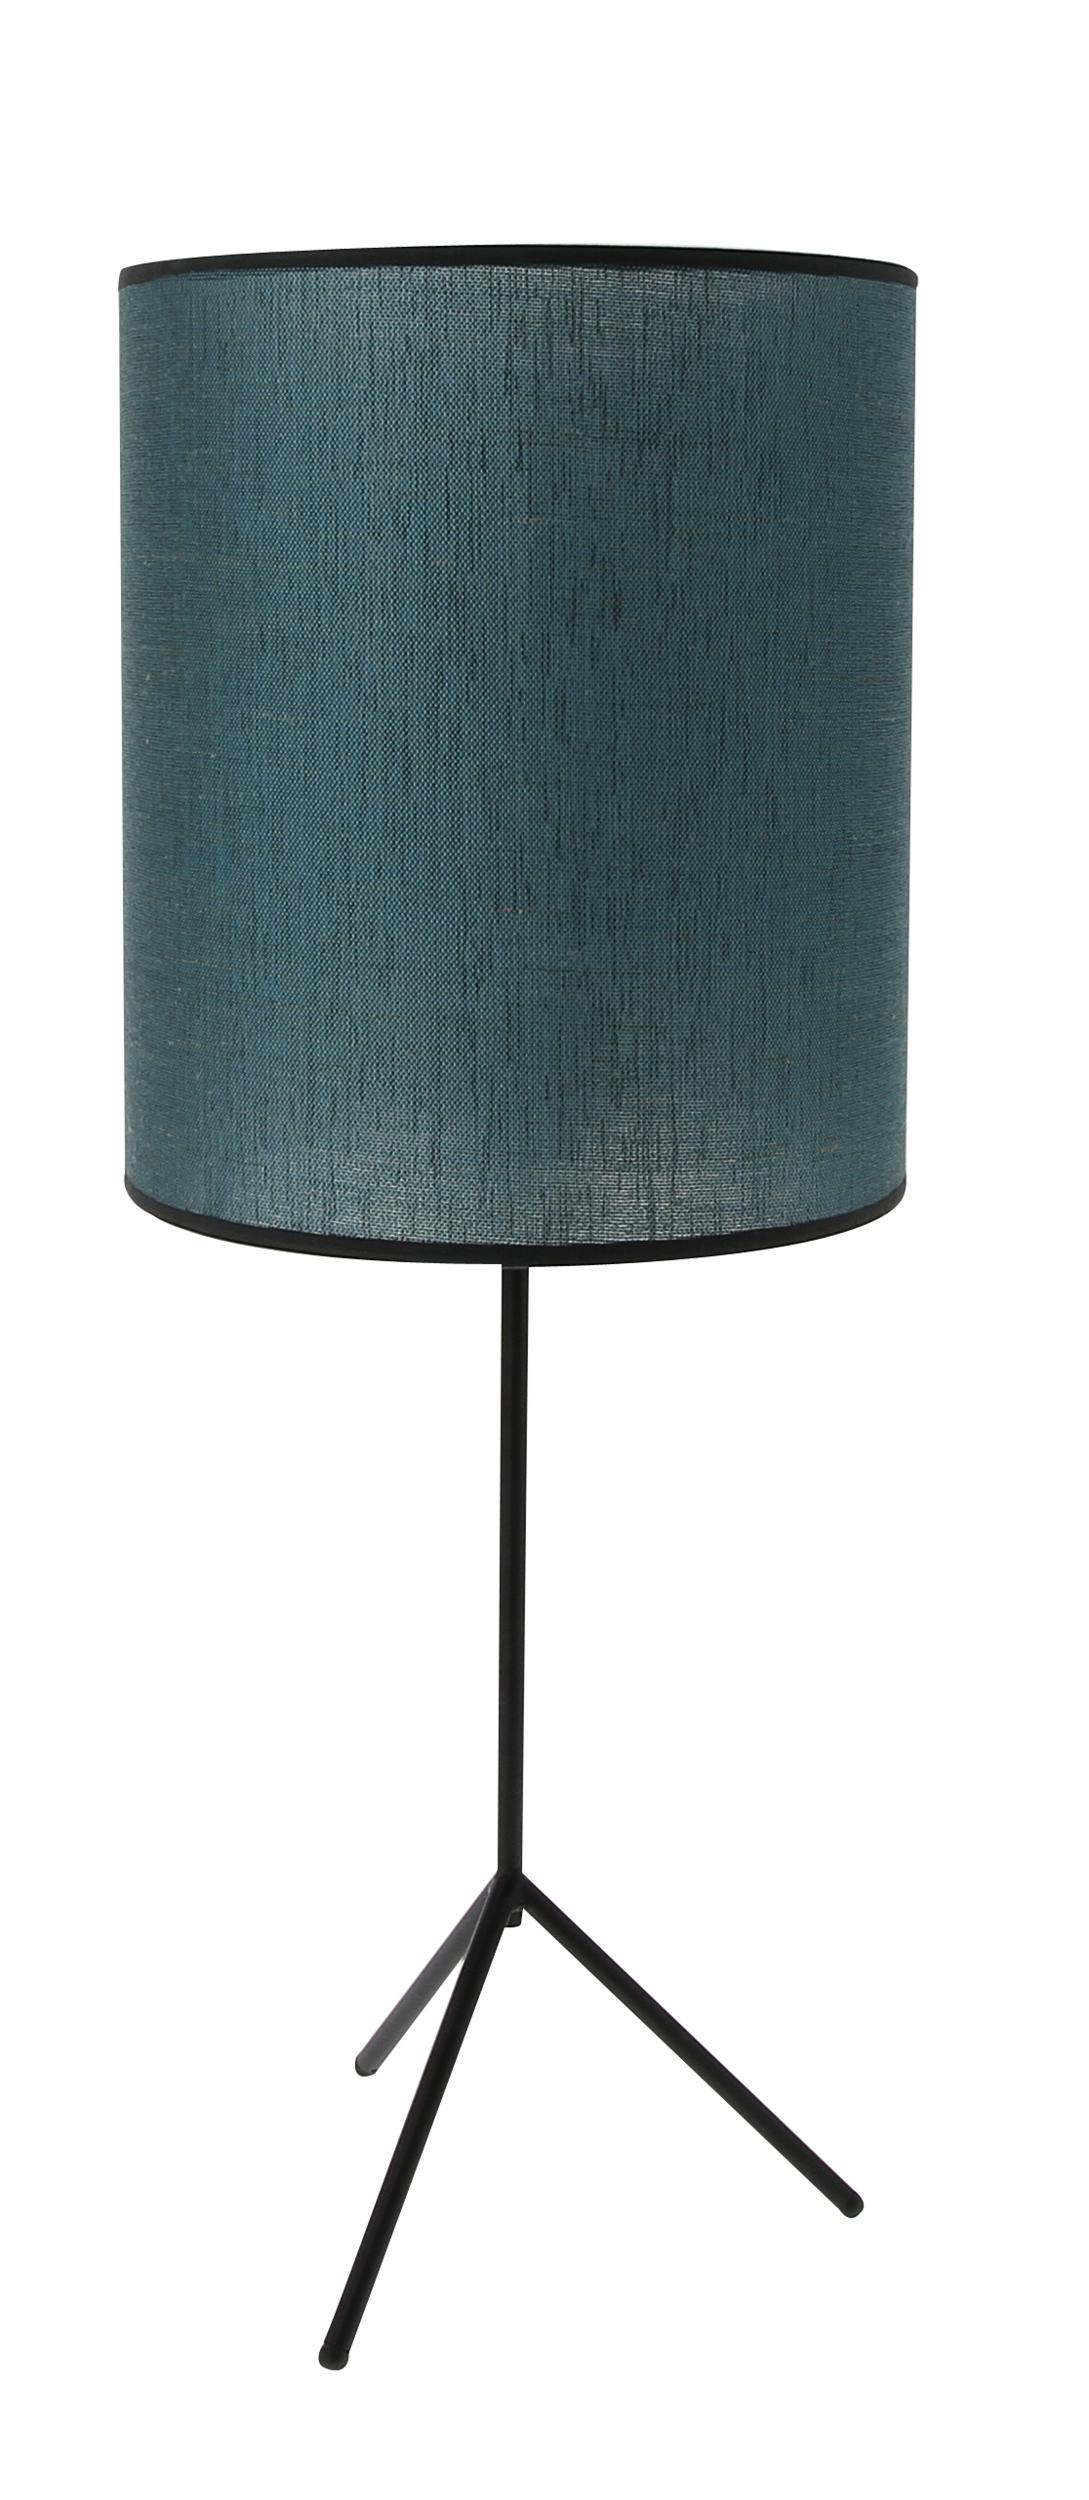 Lampe Robert bleu curaçao